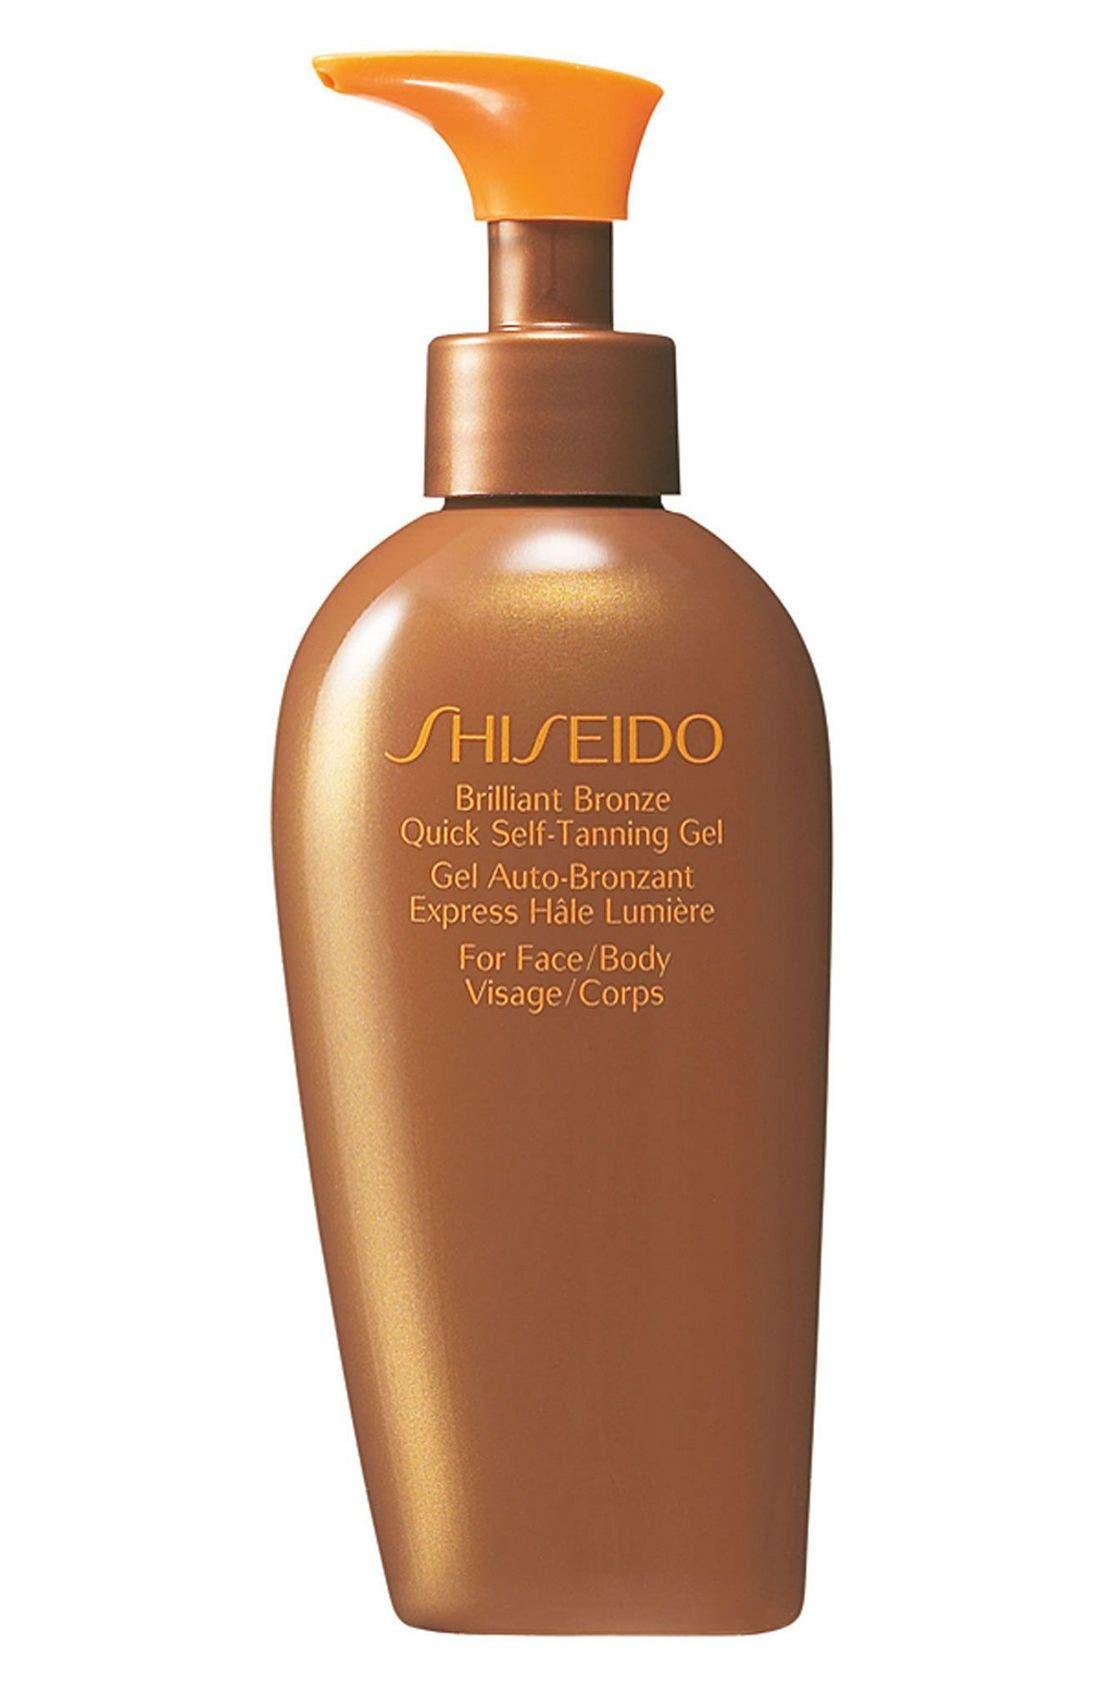 SHISEIDO, Brilliant Bronze Quick Self-Tanning Gel, Main thumbnail 1, color, 000